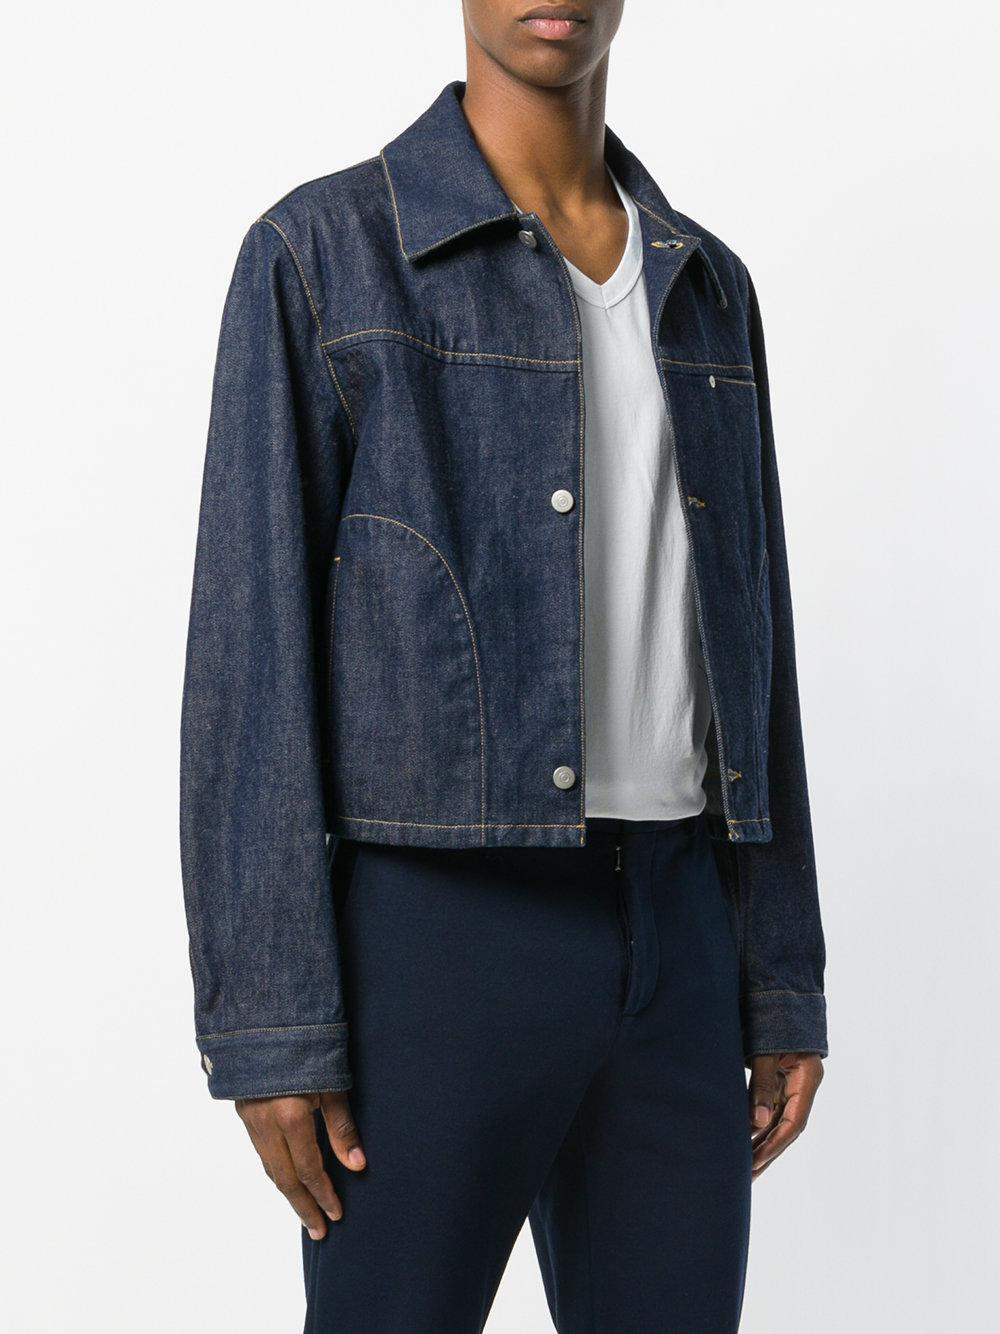 Maison Margiela Fitted Denim Jacket in Blue for Men